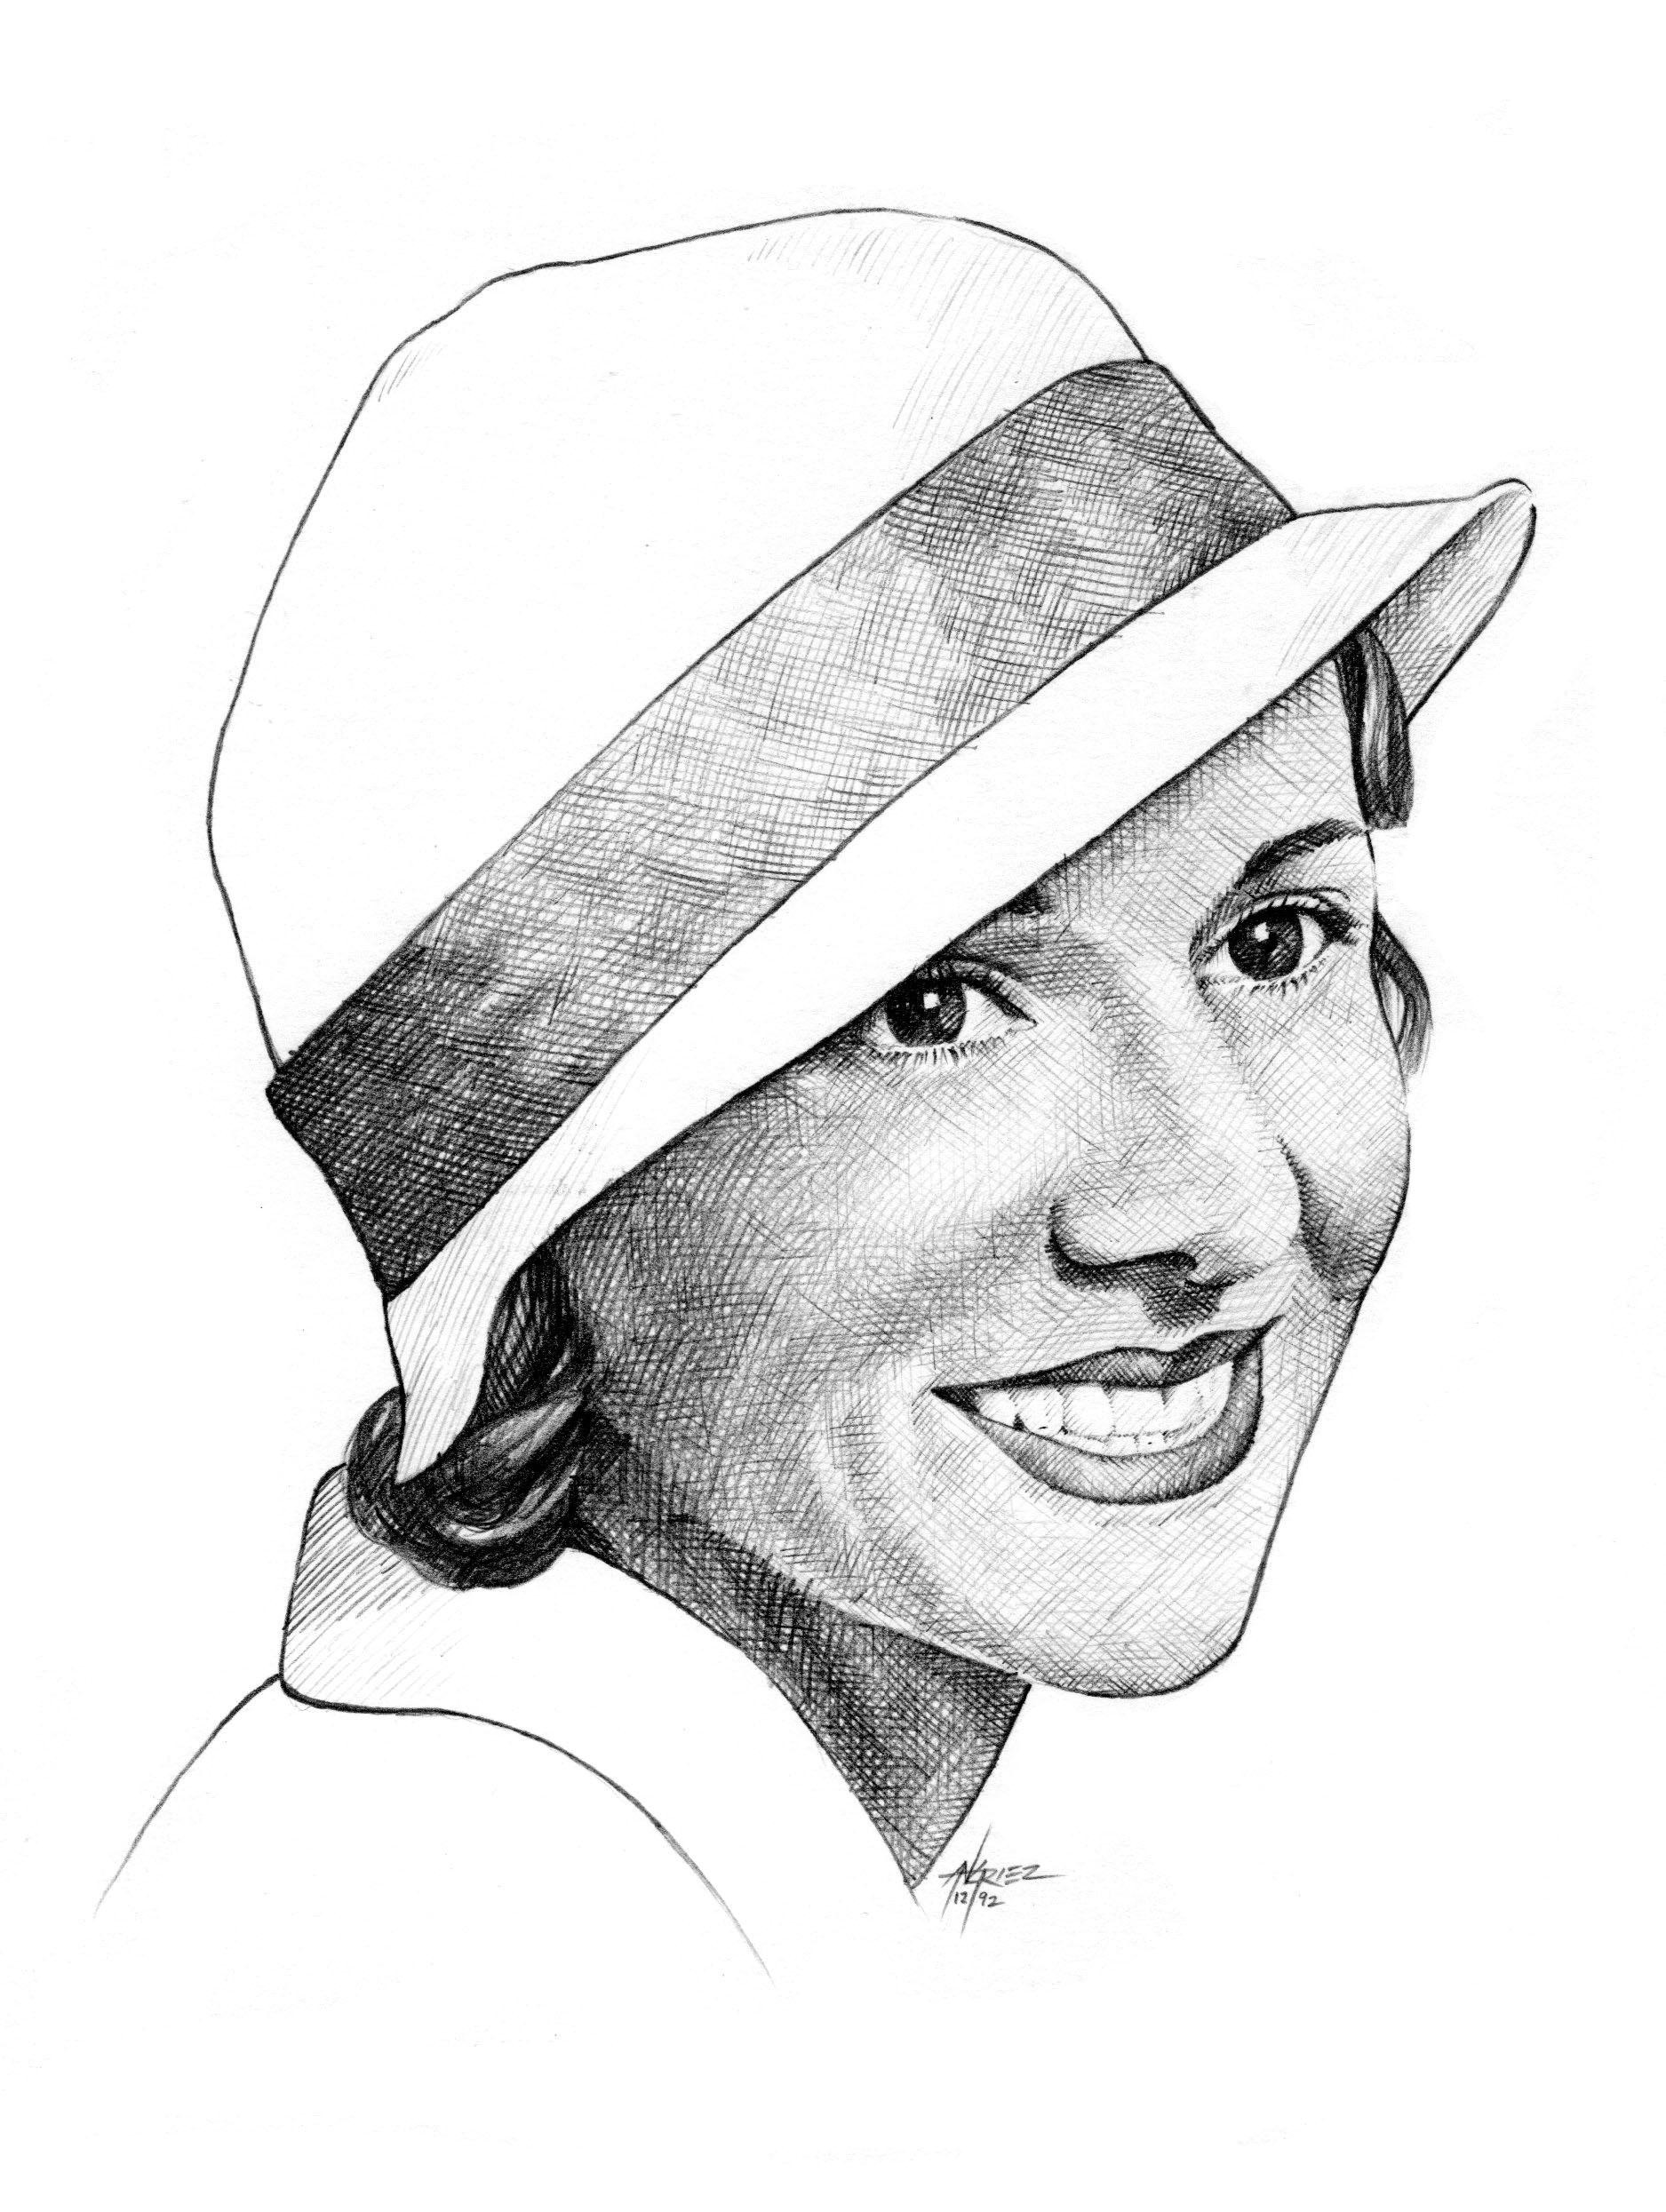 Gma Jeanette drawing.jpg